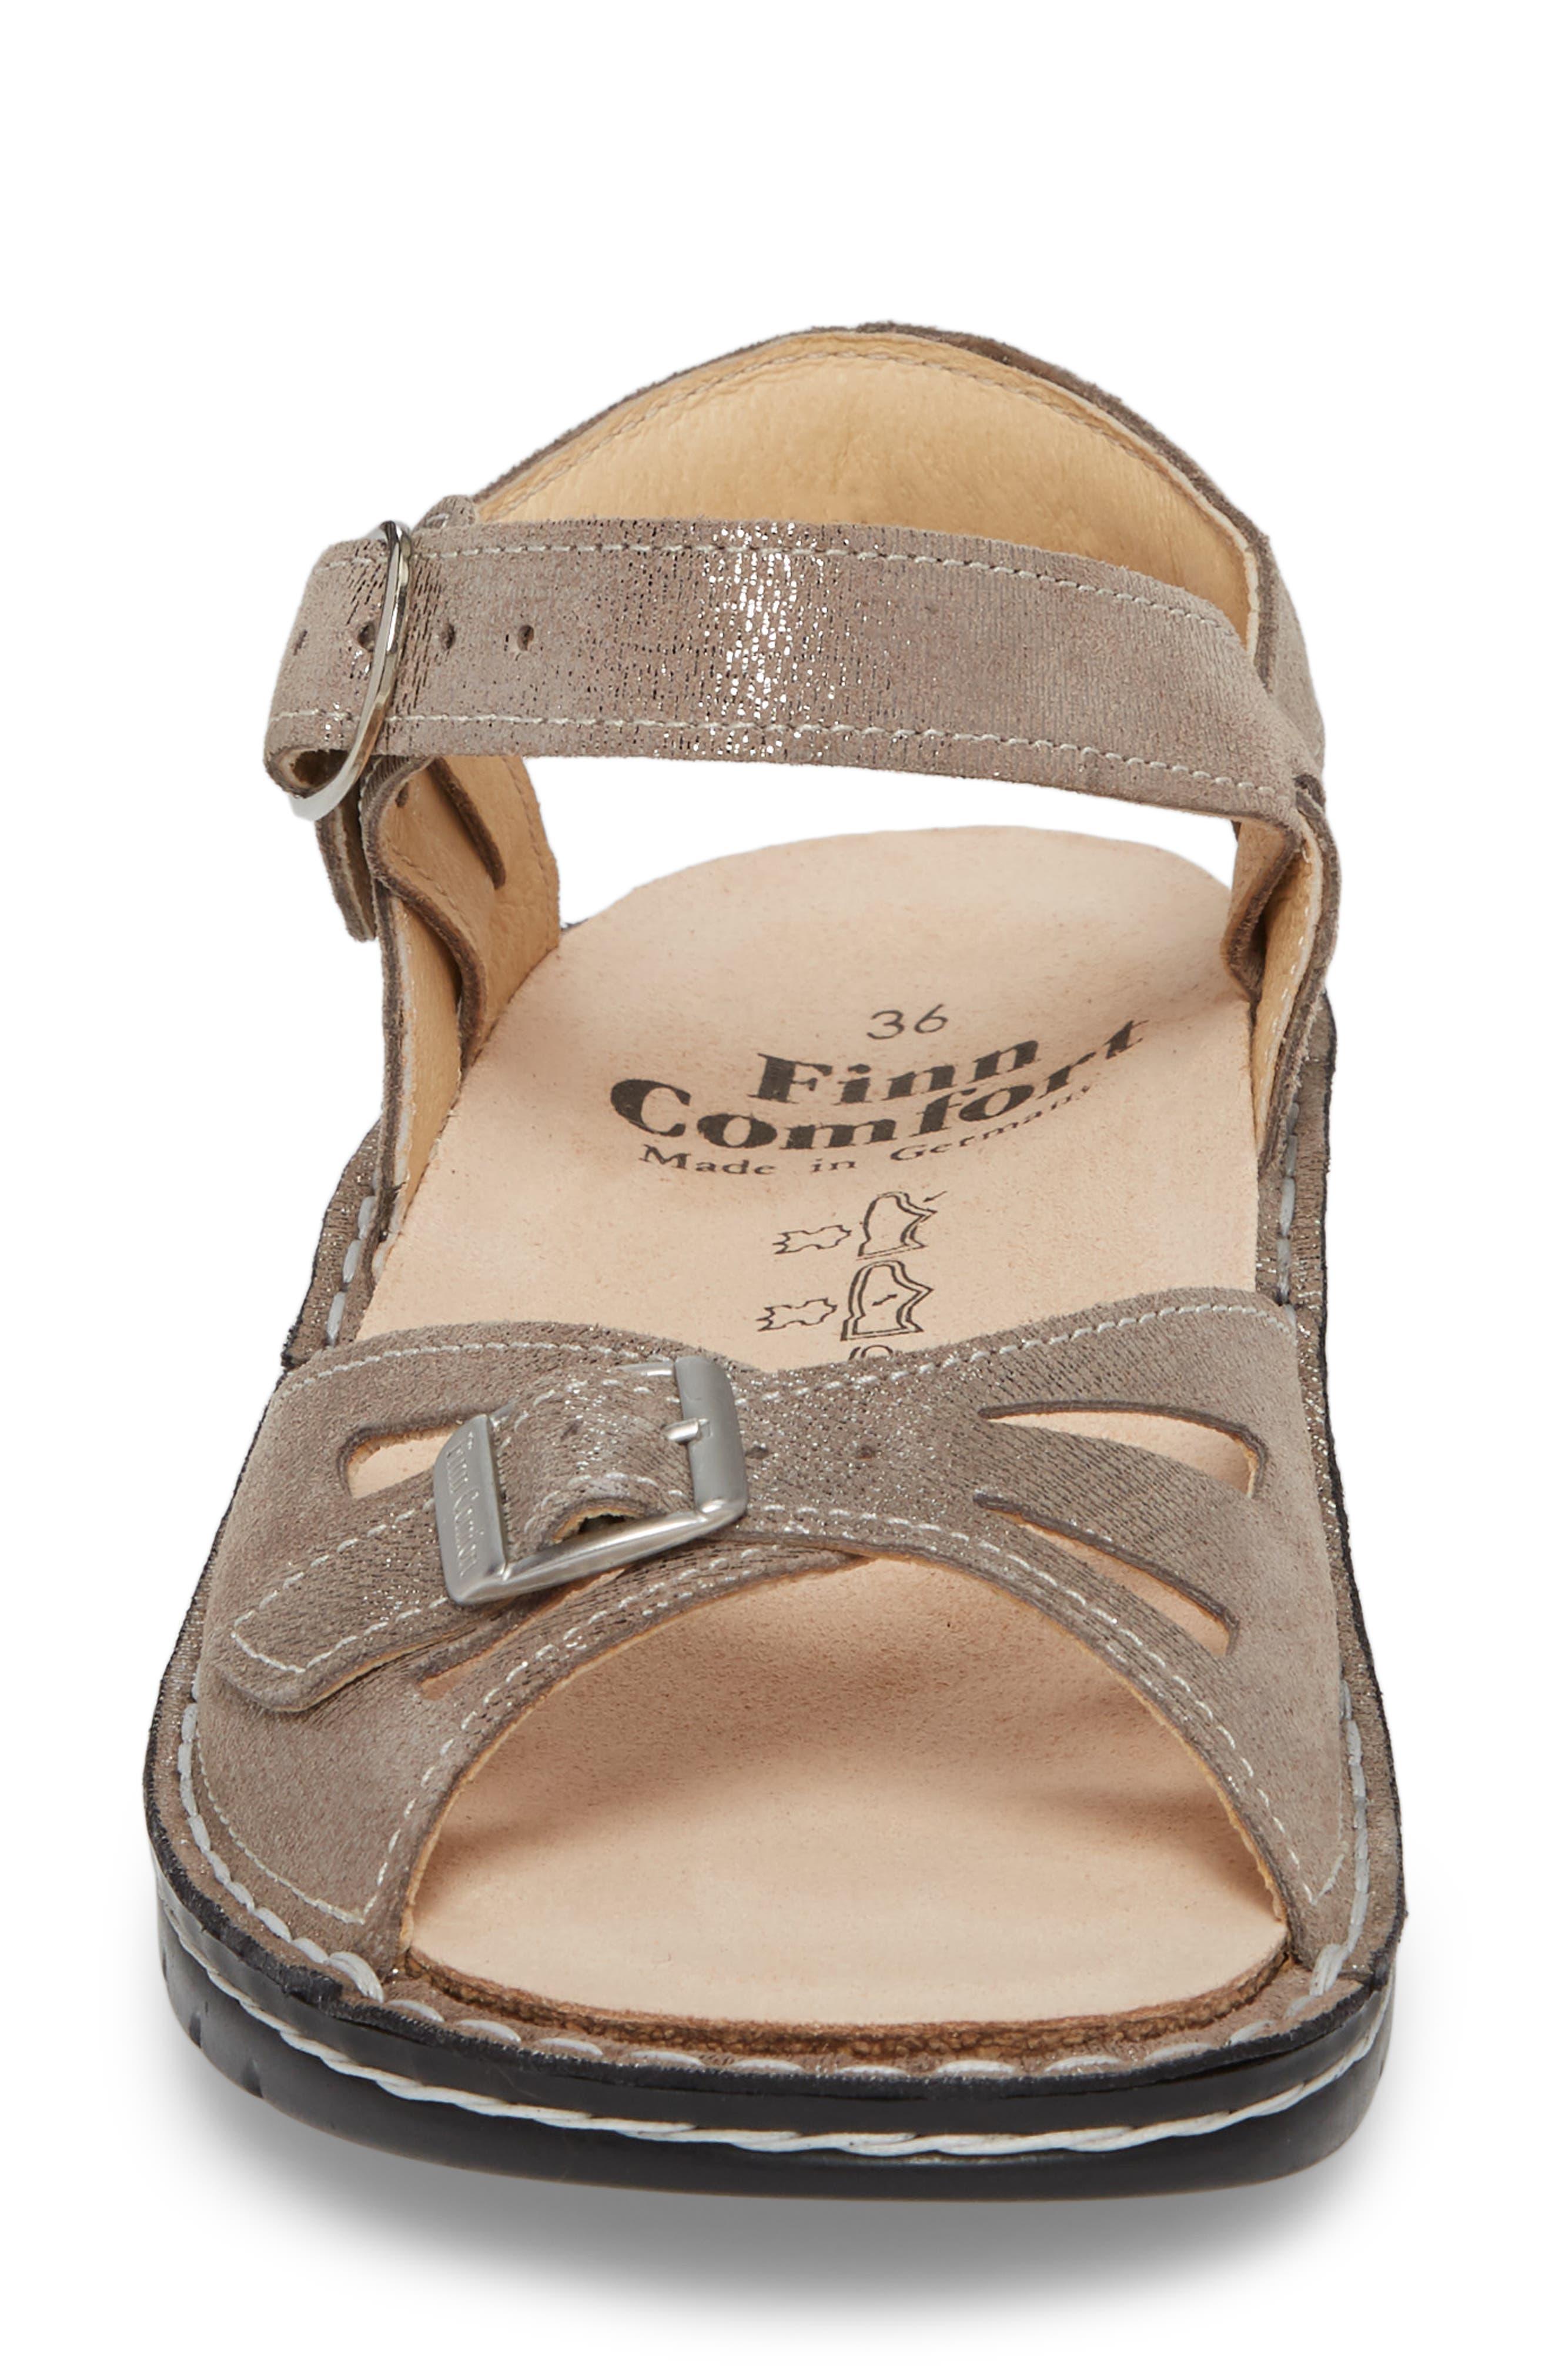 Motomachi Sandal,                             Alternate thumbnail 4, color,                             Fango Leather